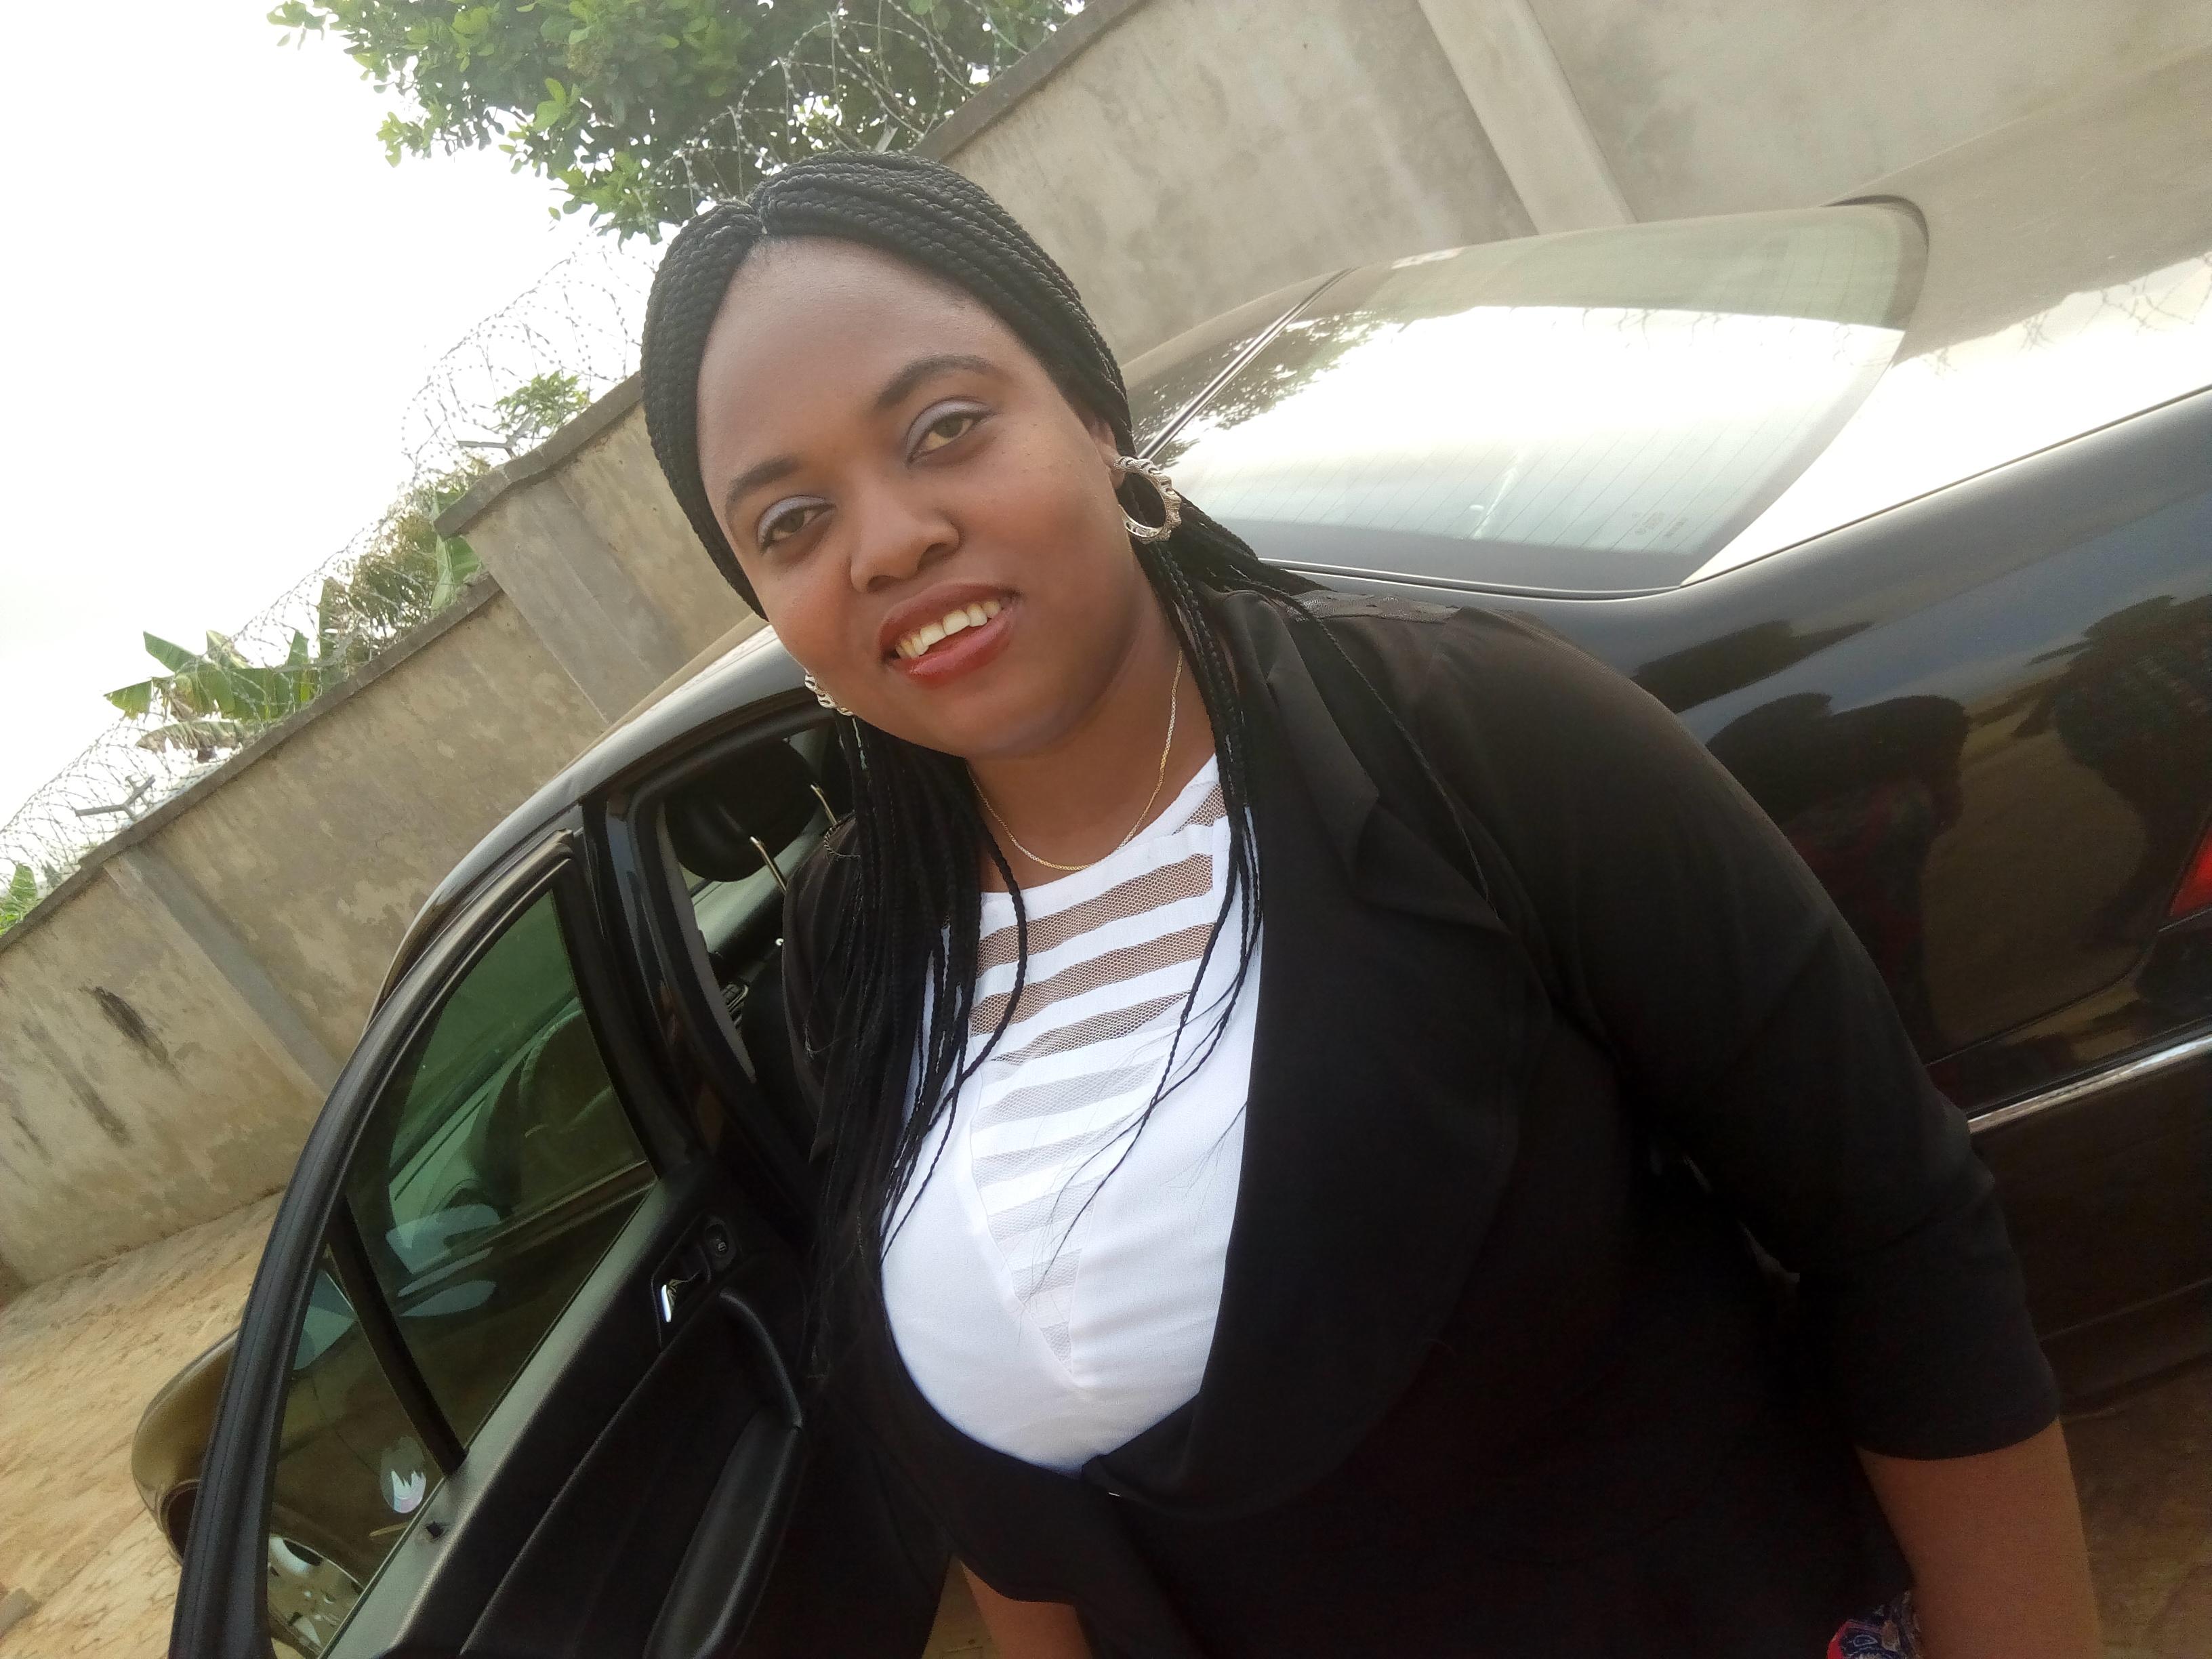 Oluwanifesimi Adewole